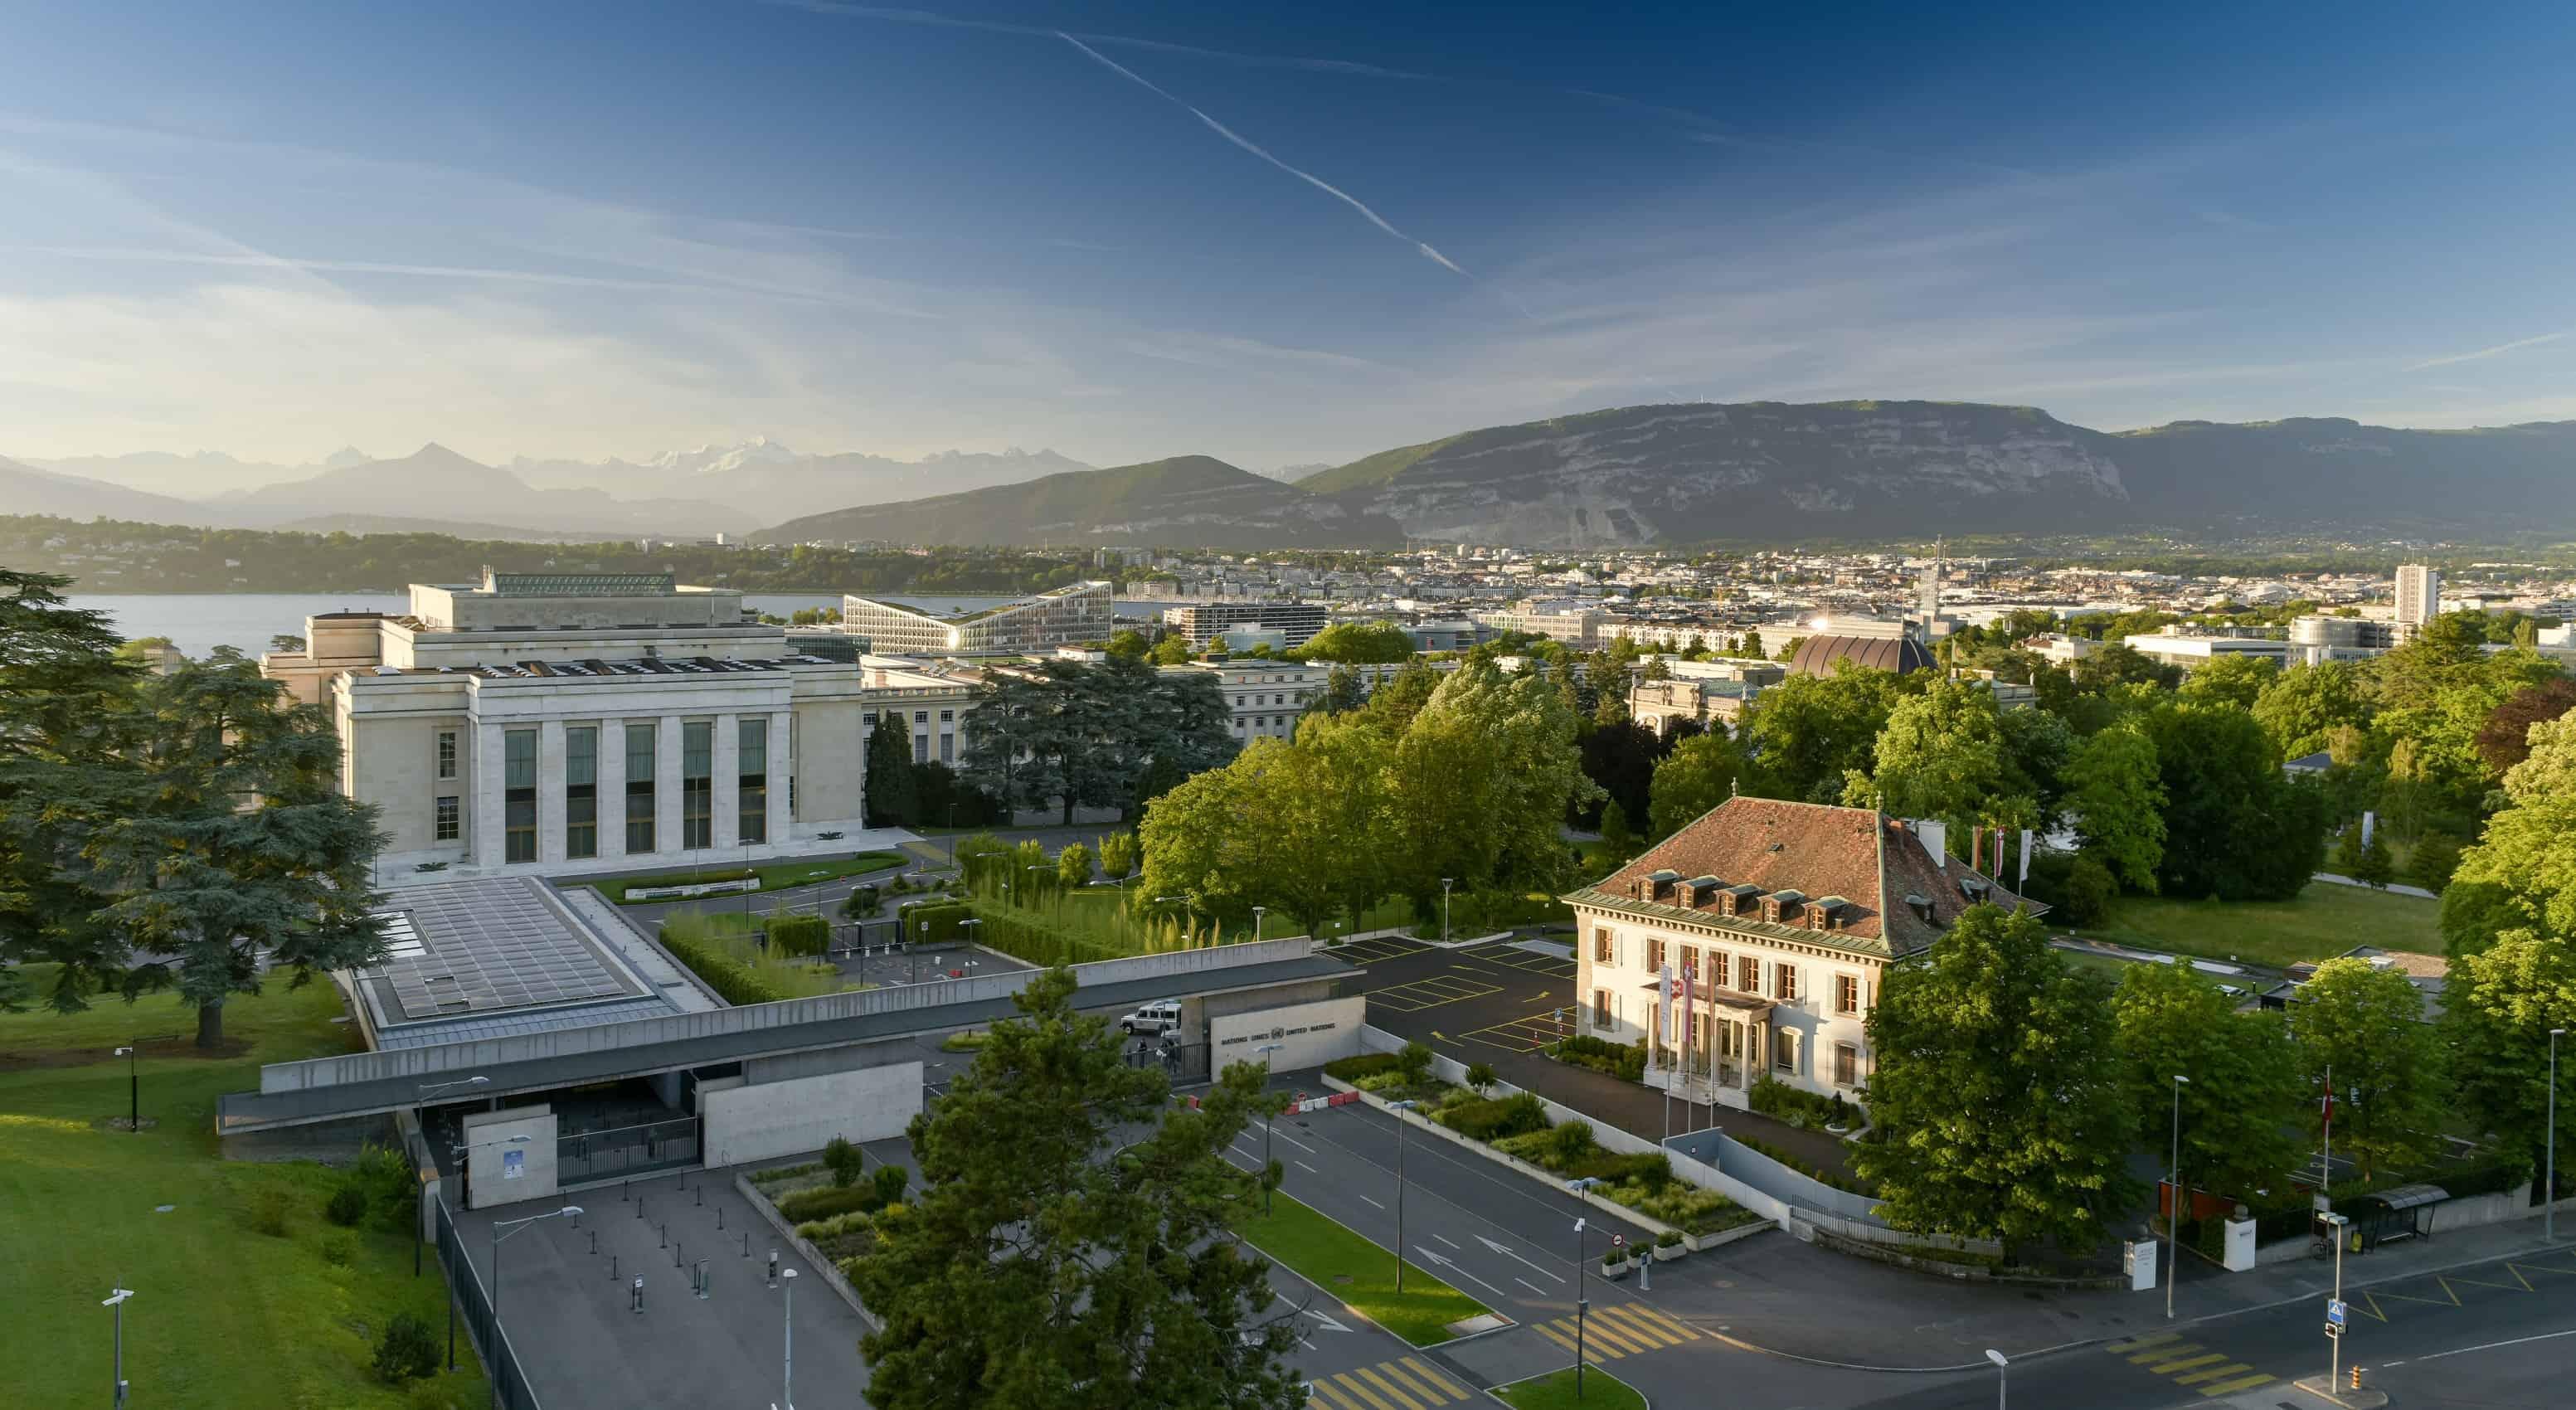 Ecole Hoteliere Geneve - Relations publiques de l'École Hoteliere de Geneve, Suisse - Hotel Management School of Geneva in Switzerand